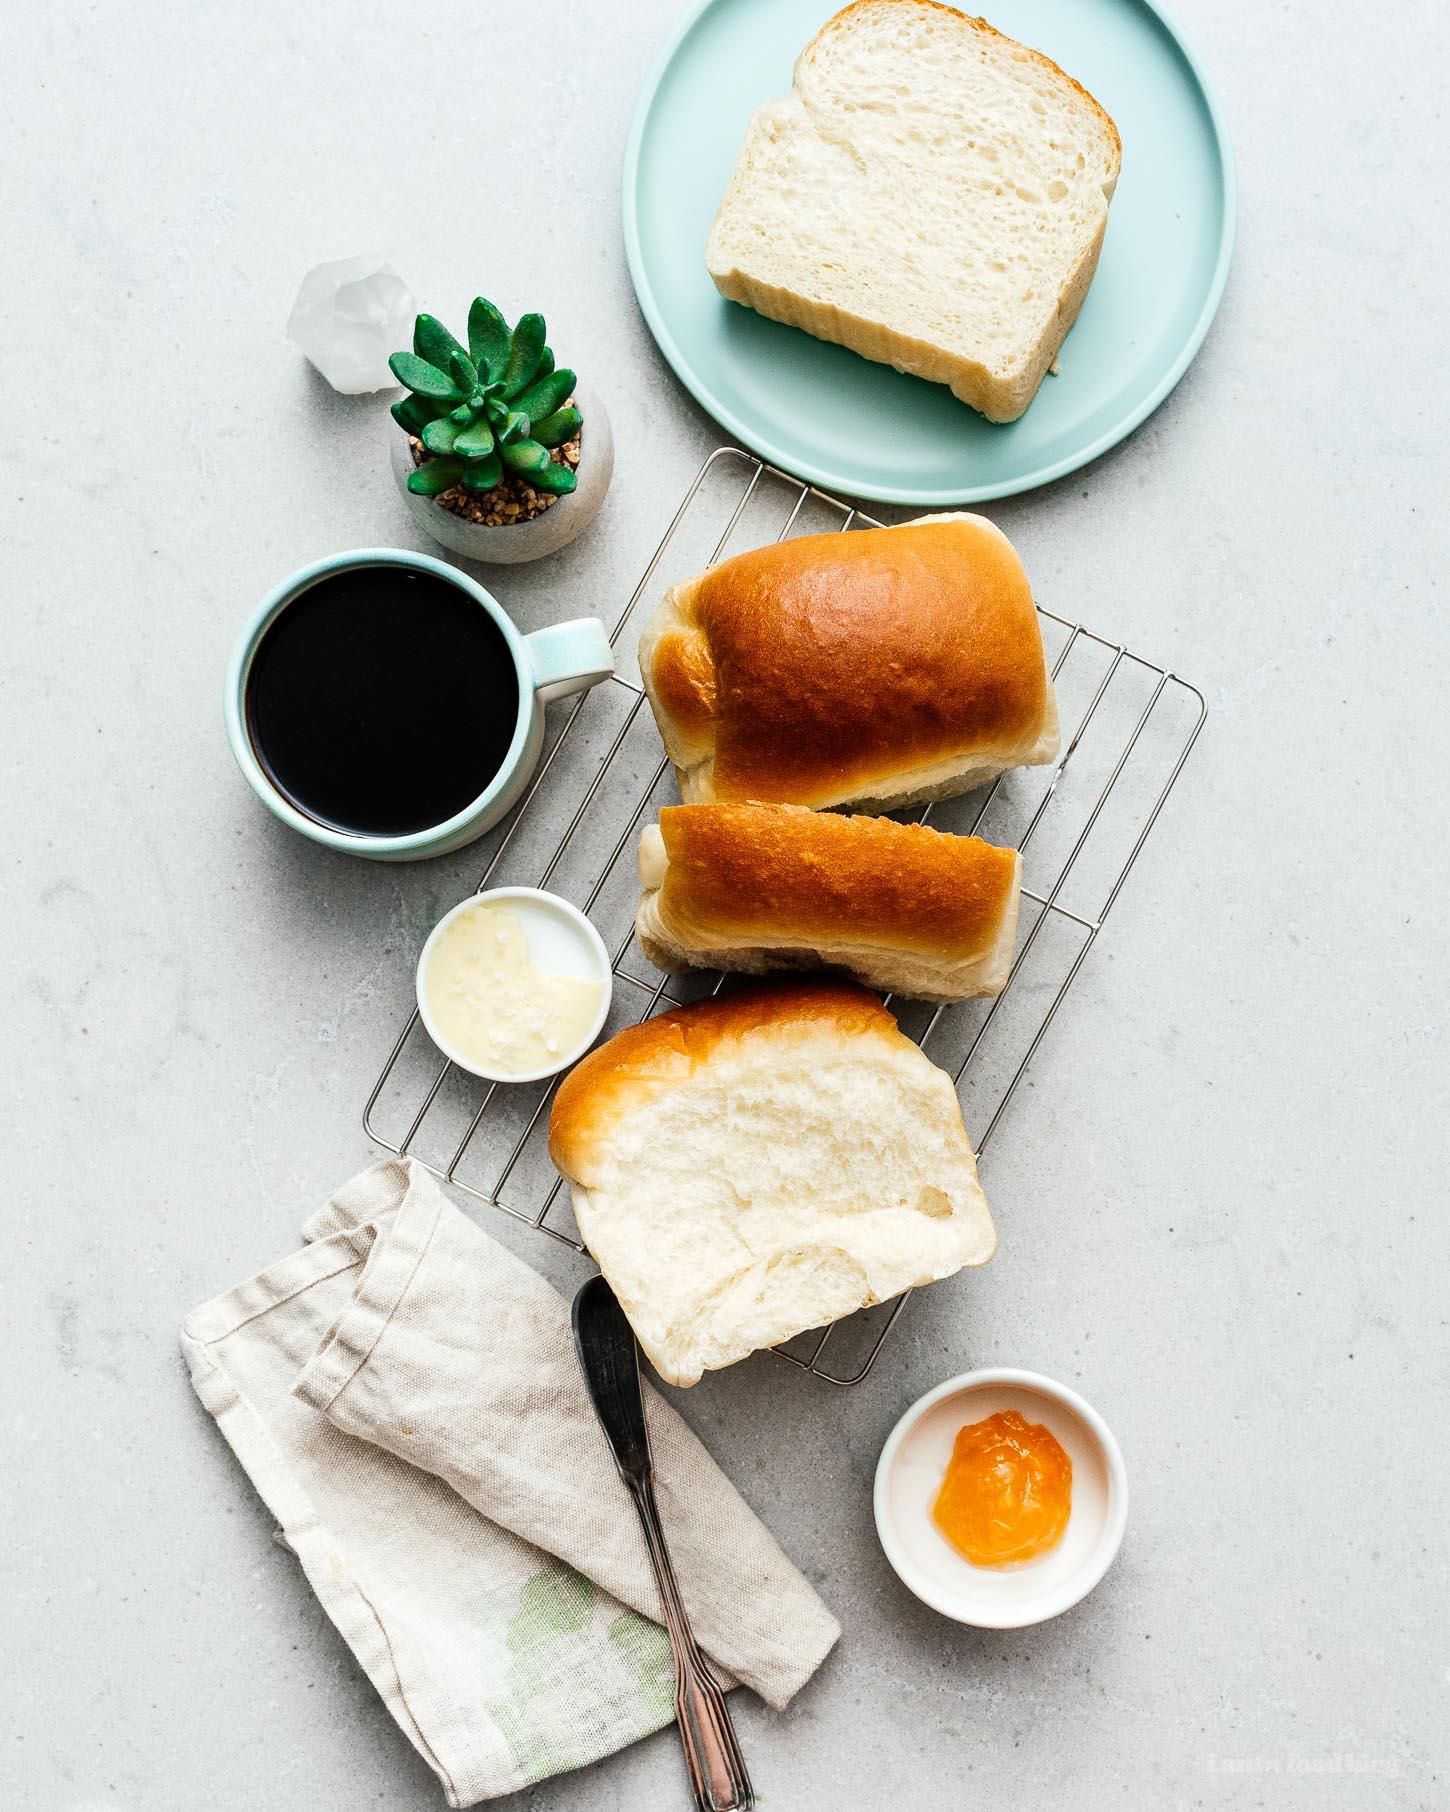 hokkaido milk bread | www.iamafoodblog.com